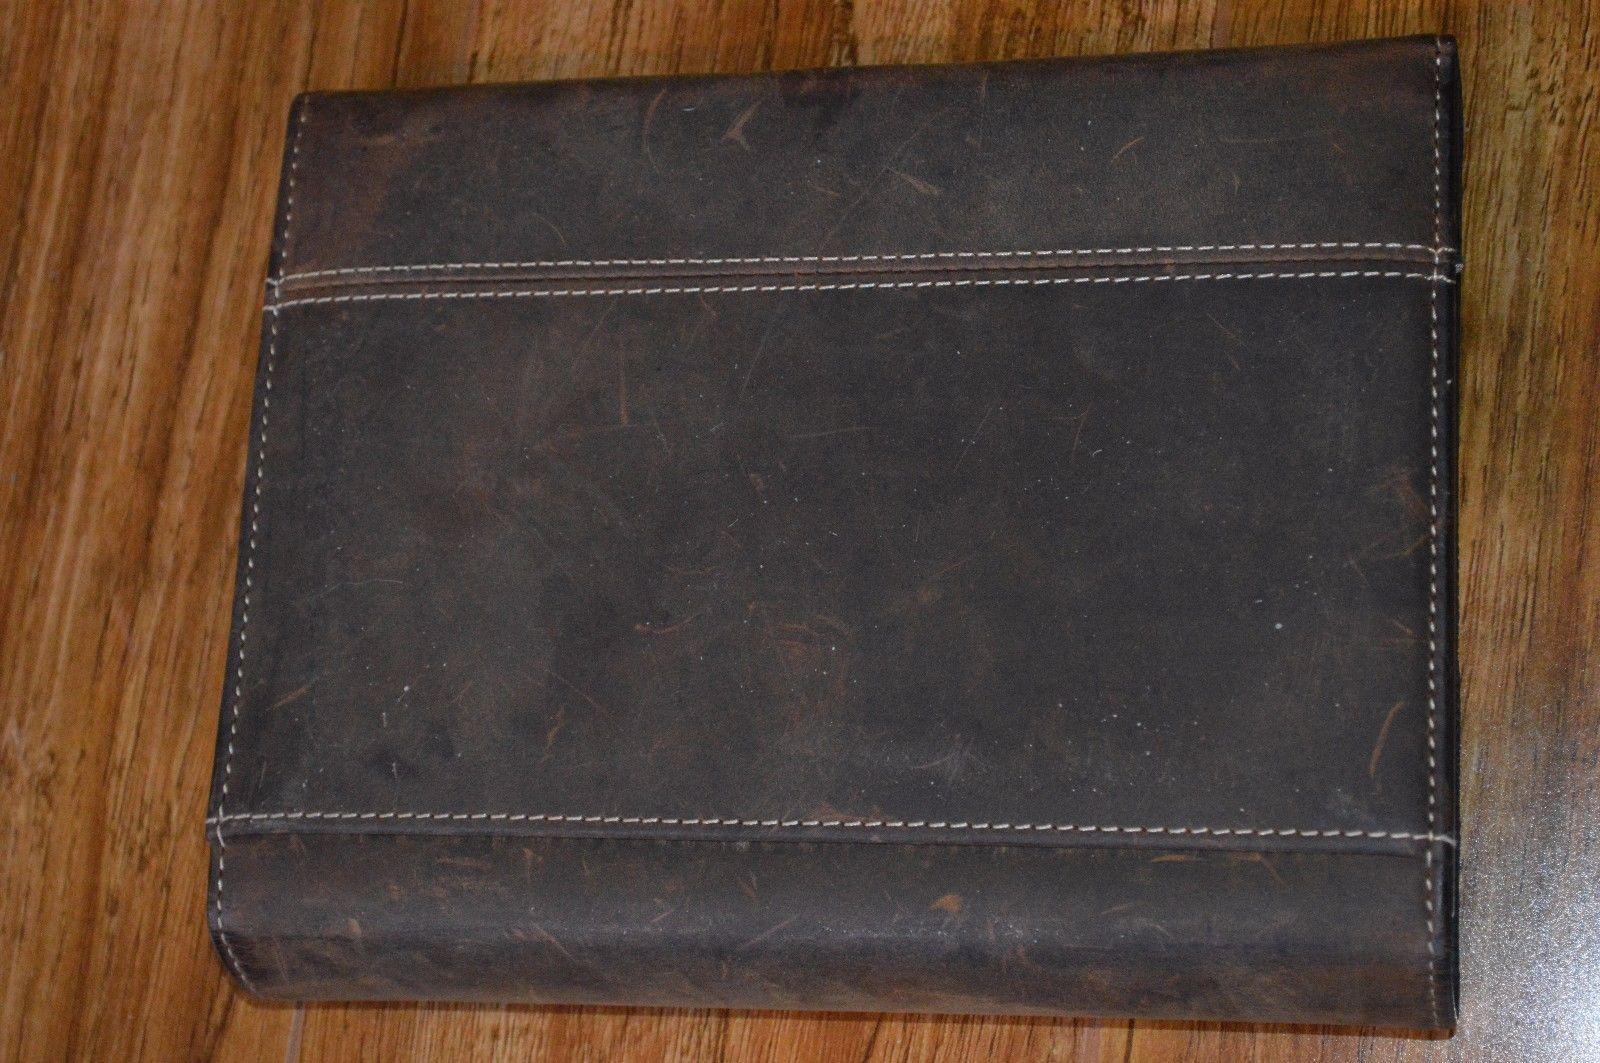 Brookstone tablet case